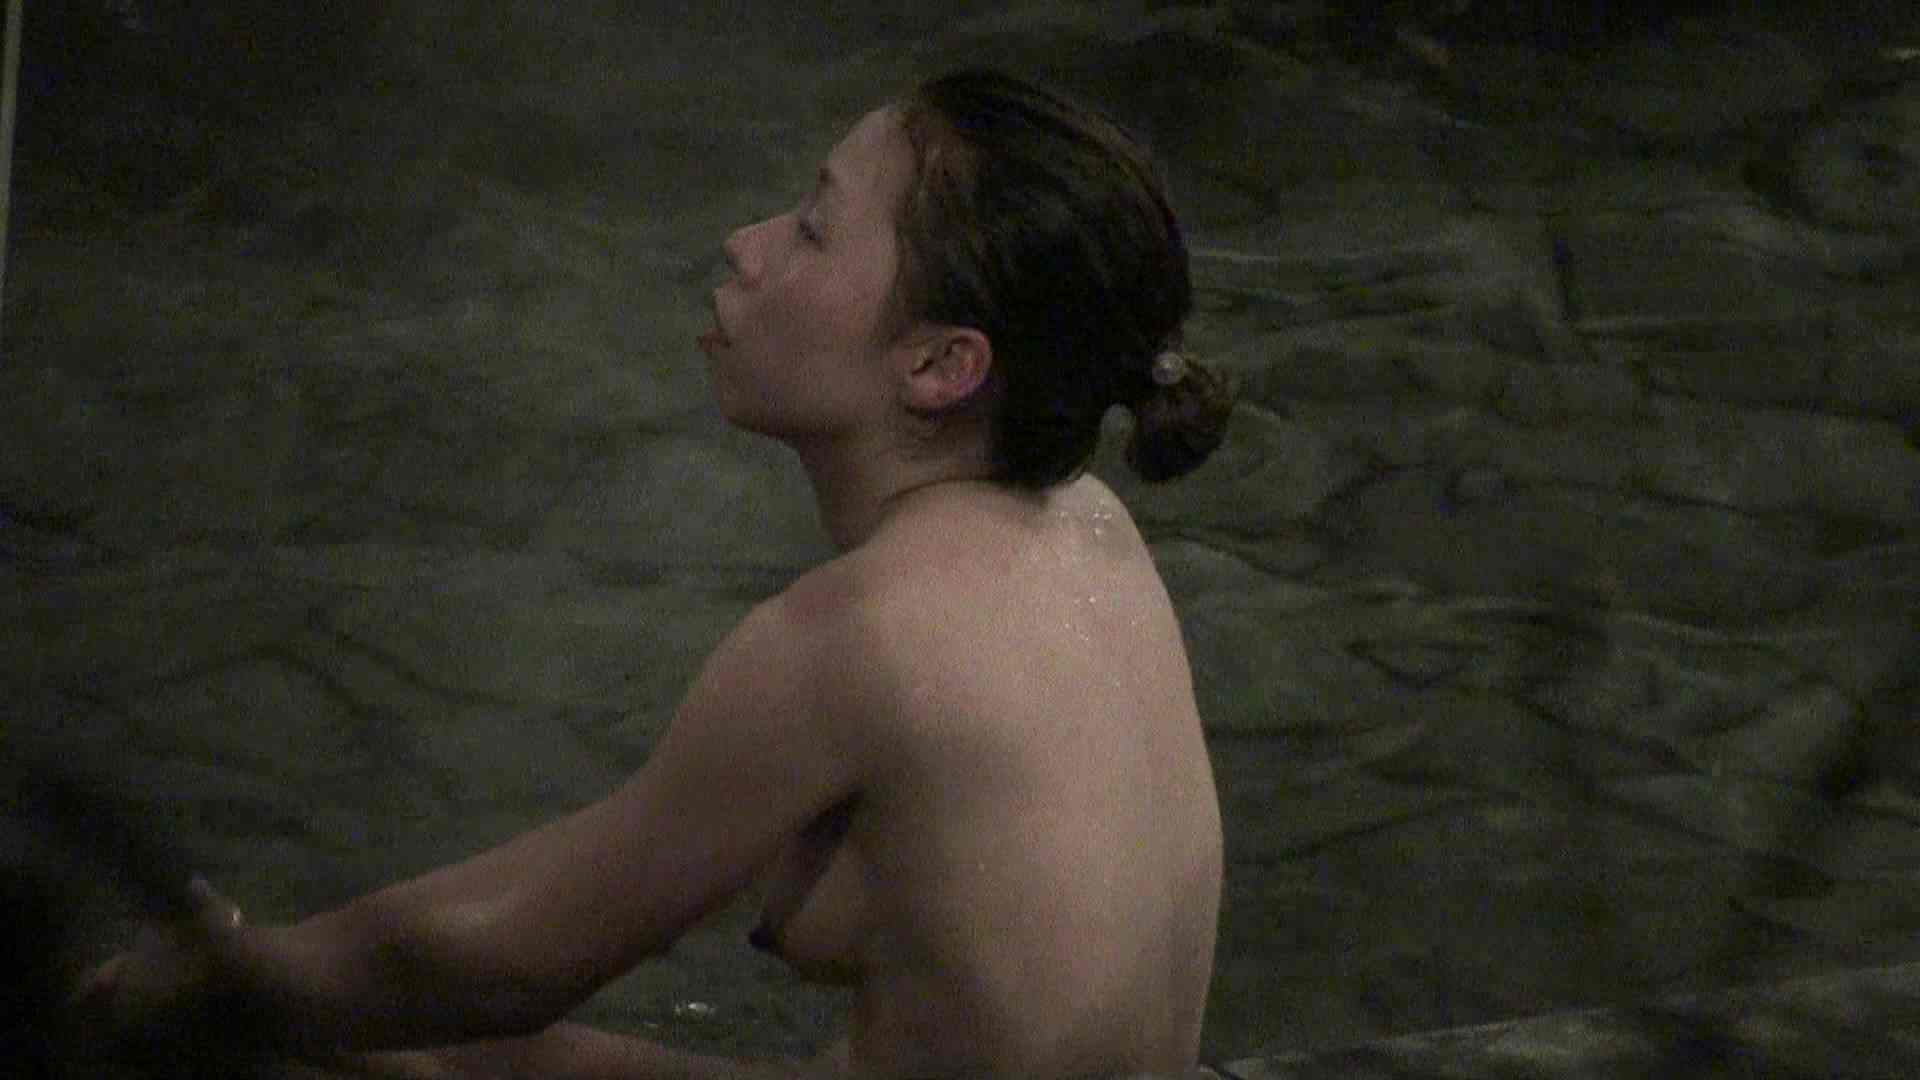 Aquaな露天風呂Vol.391 美しいOLの裸体 えろ無修正画像 99pic 77